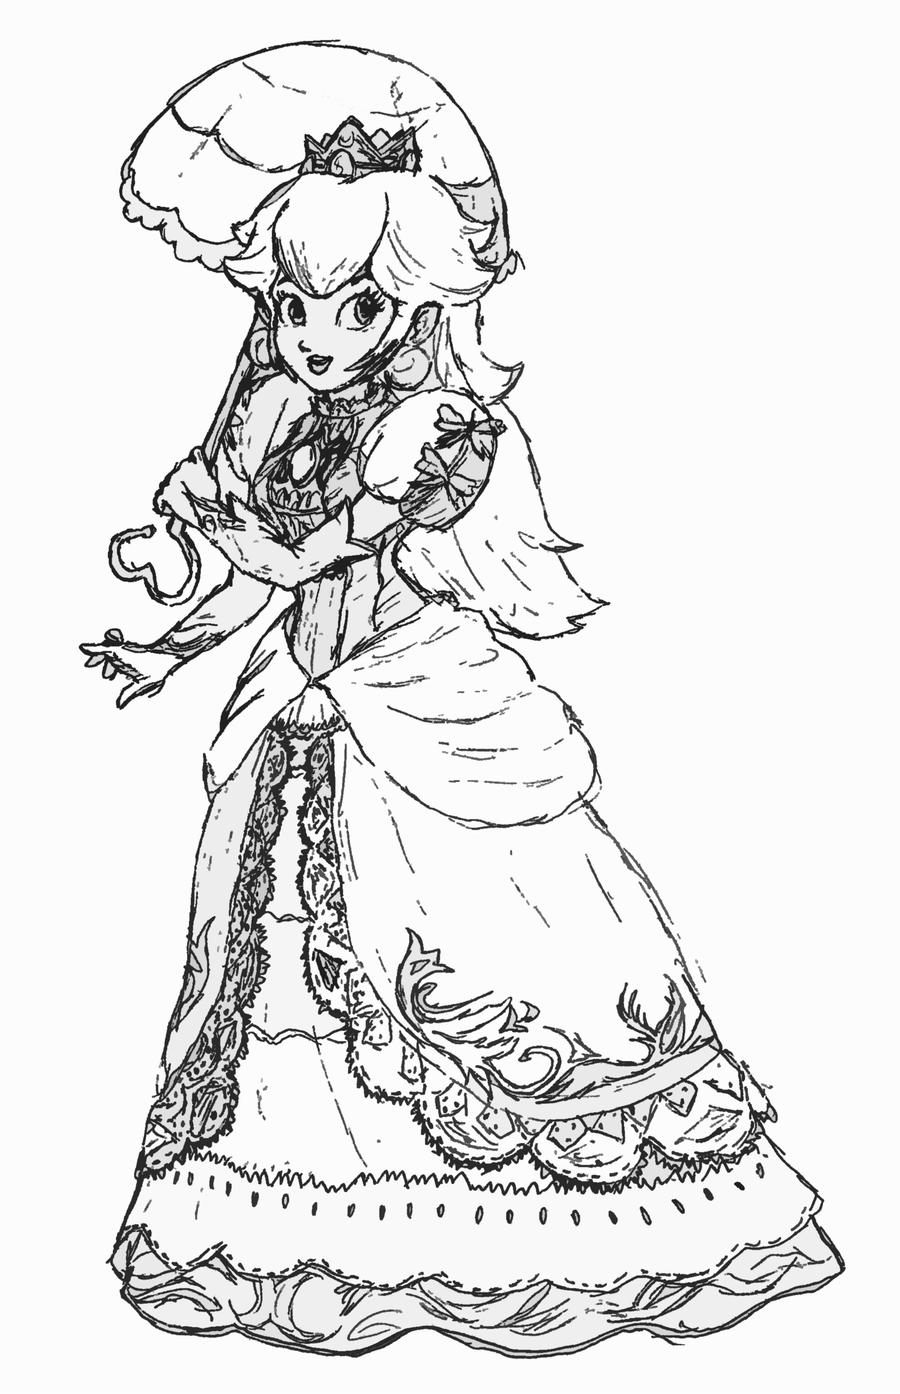 Princess Peach drawing by FireBall Stars on DeviantArt